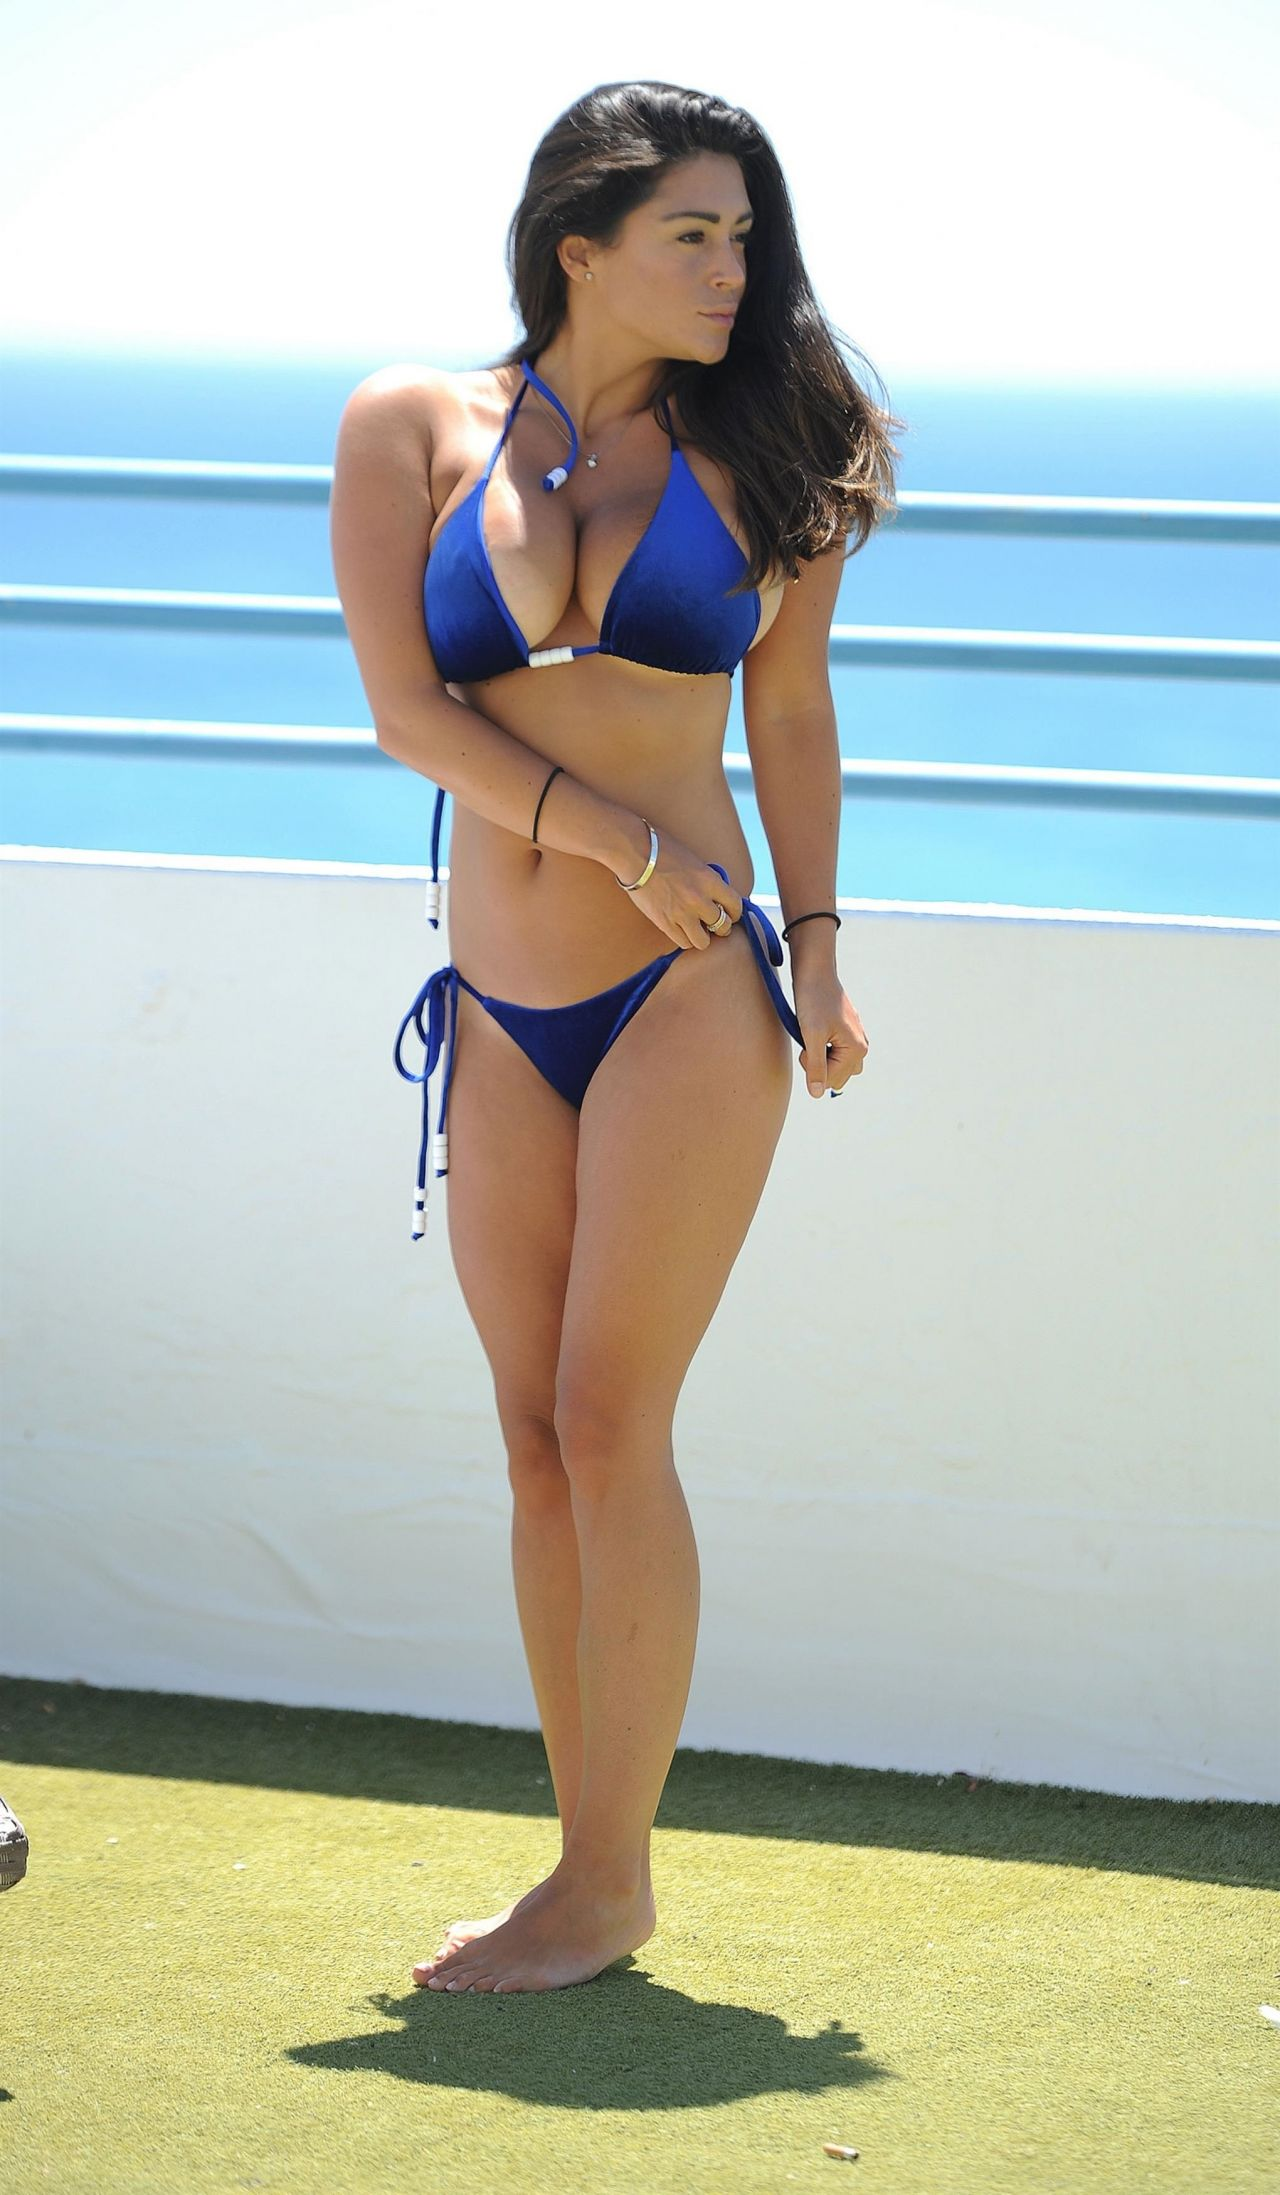 Casey Batchelor in a Blue Bikini - Cyprus 10/15/2017